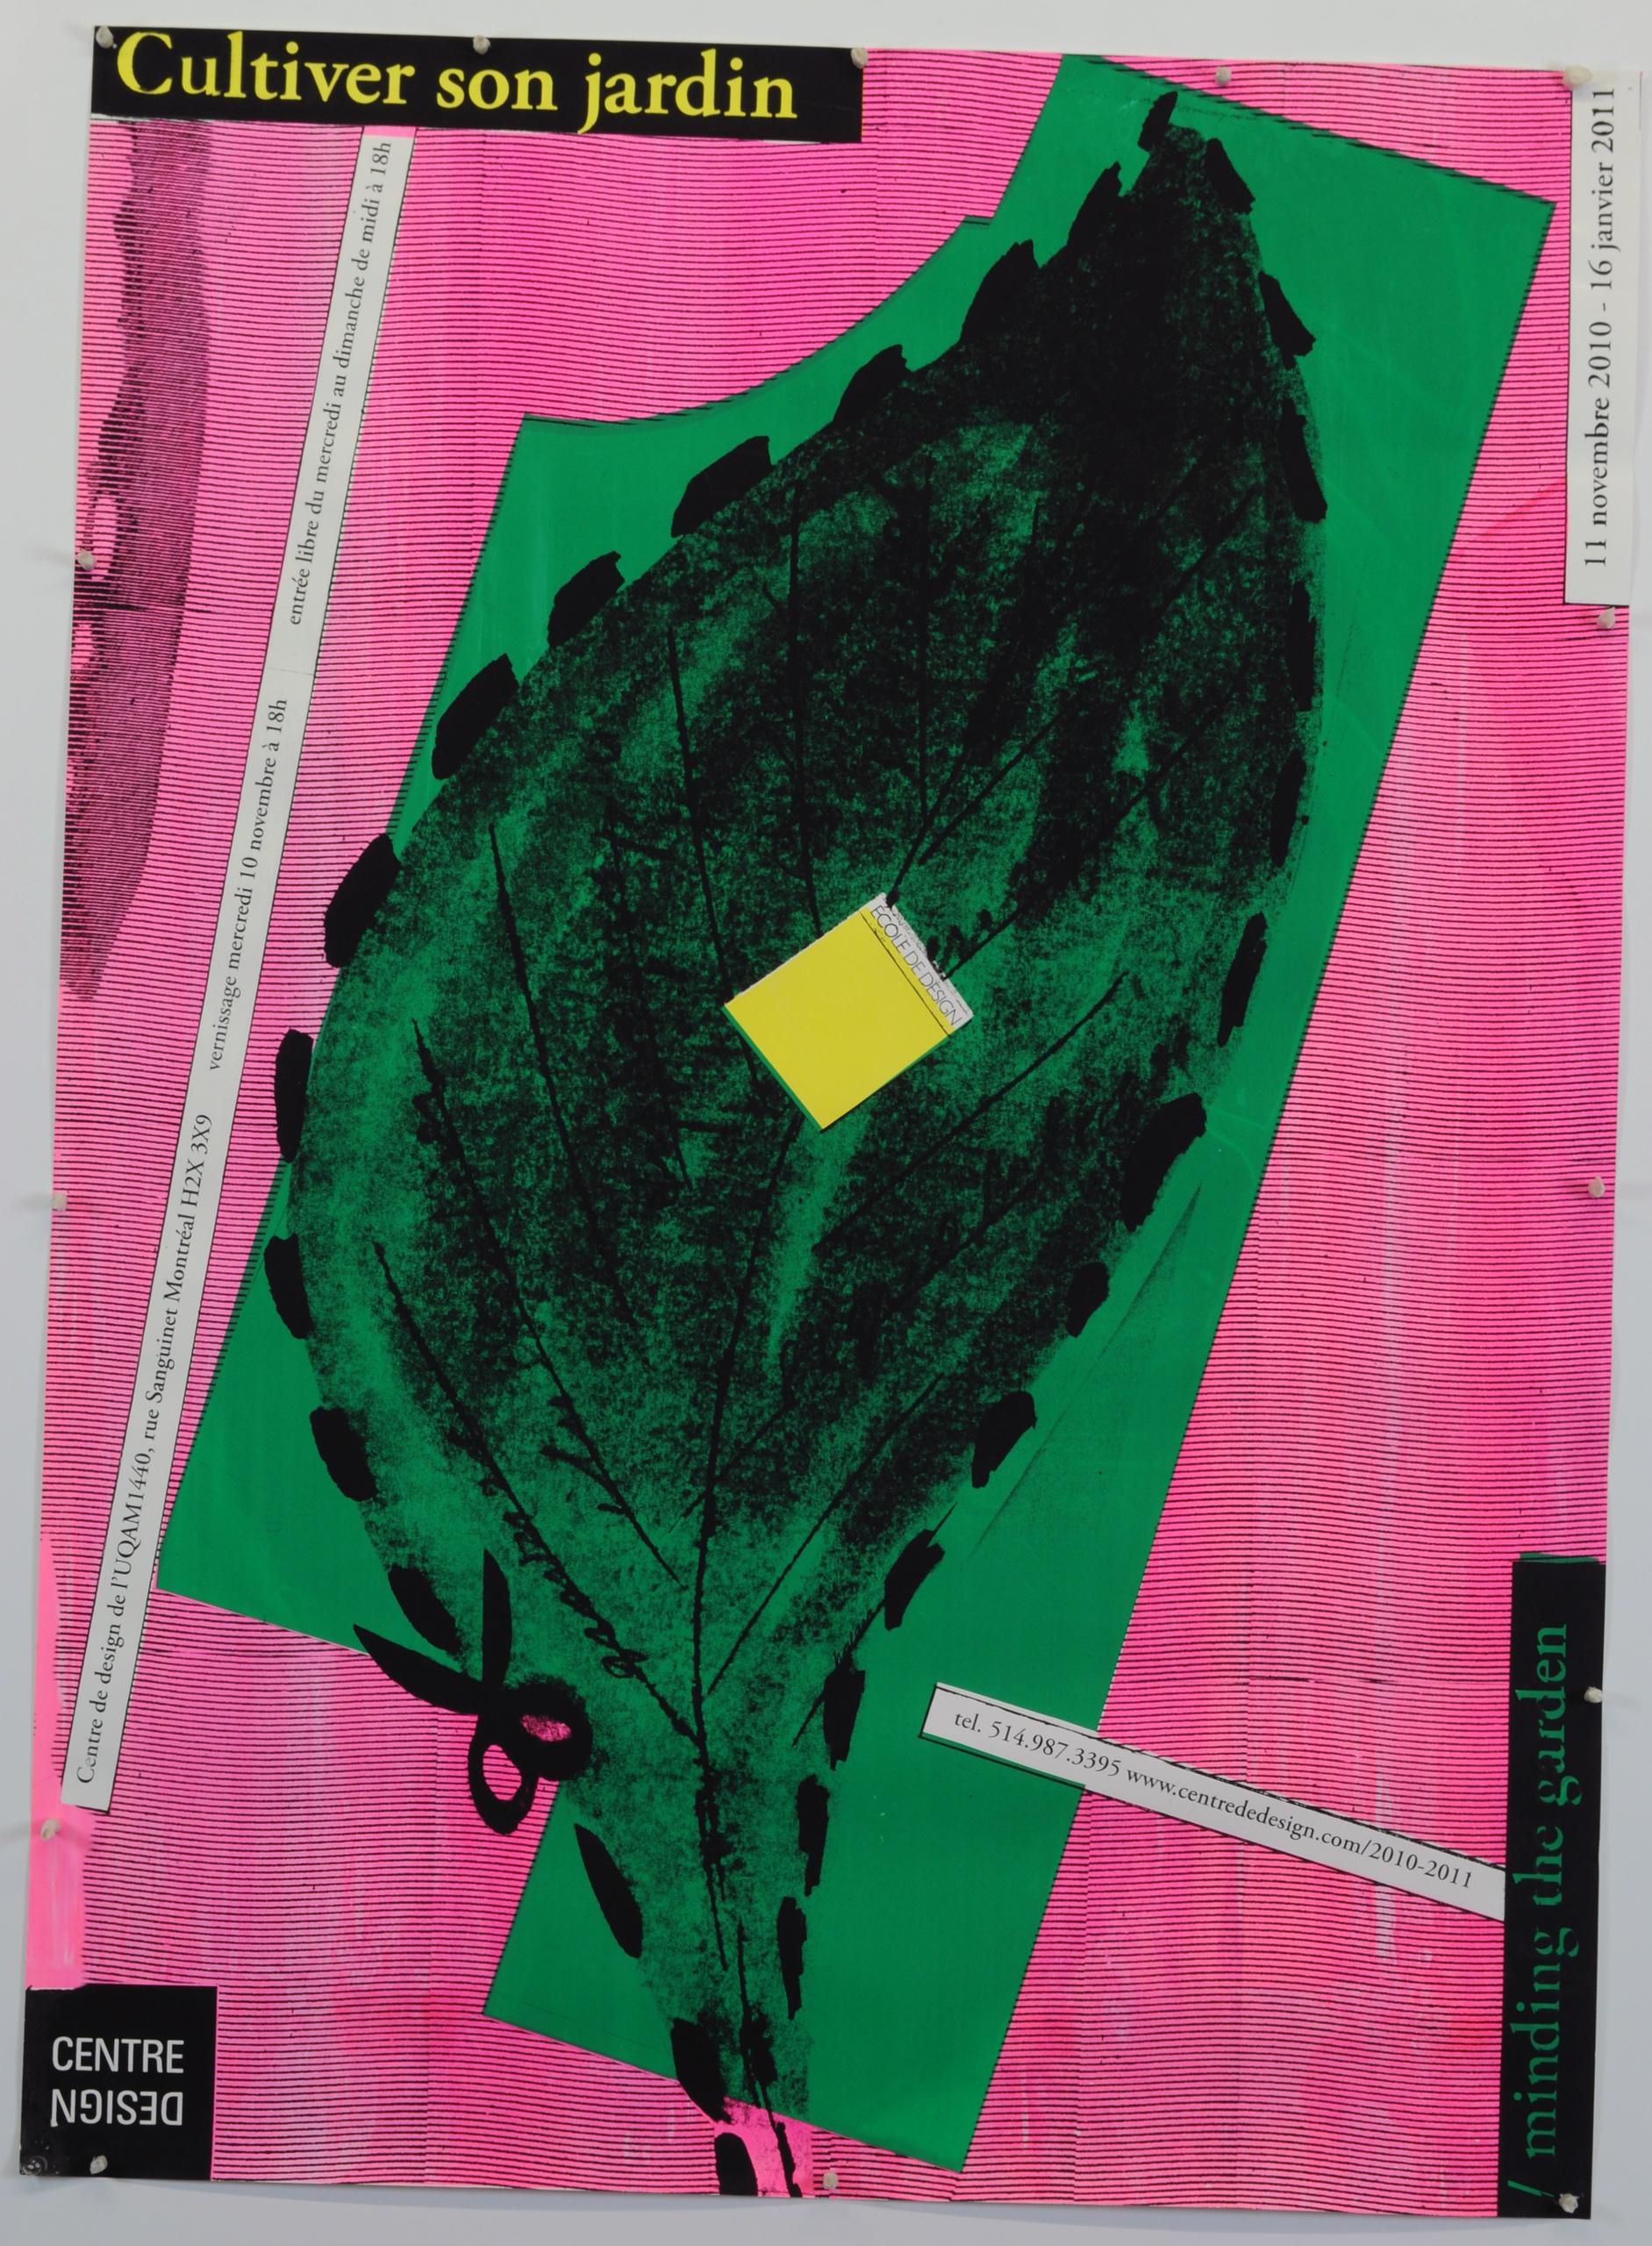 2010 - Exposition - Cultiver son jardin Minding the garden ©Alfred Halassa